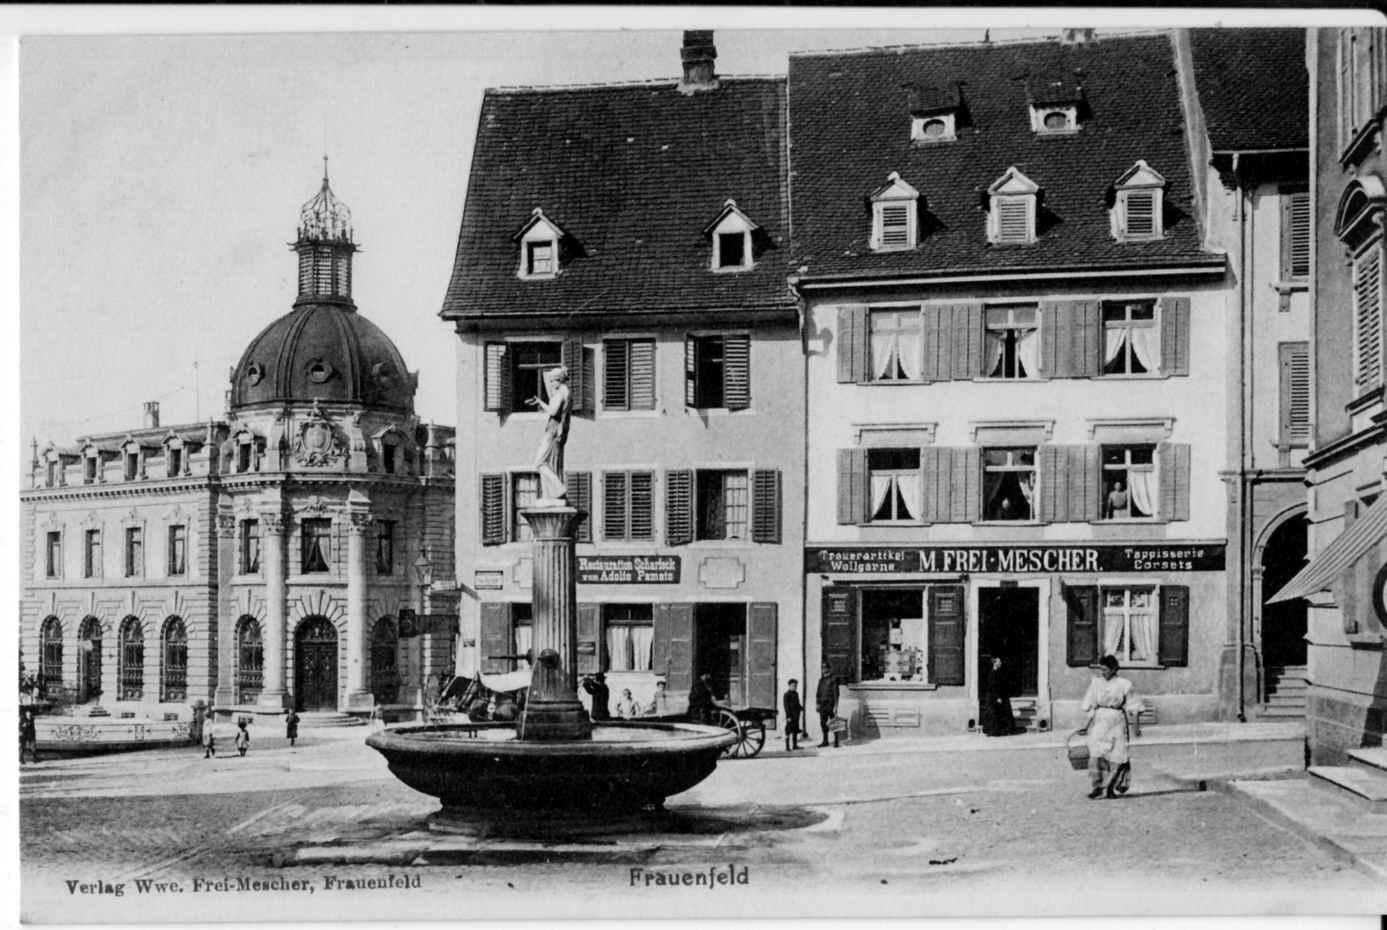 Frauenfeld alter Rathausbrunnen